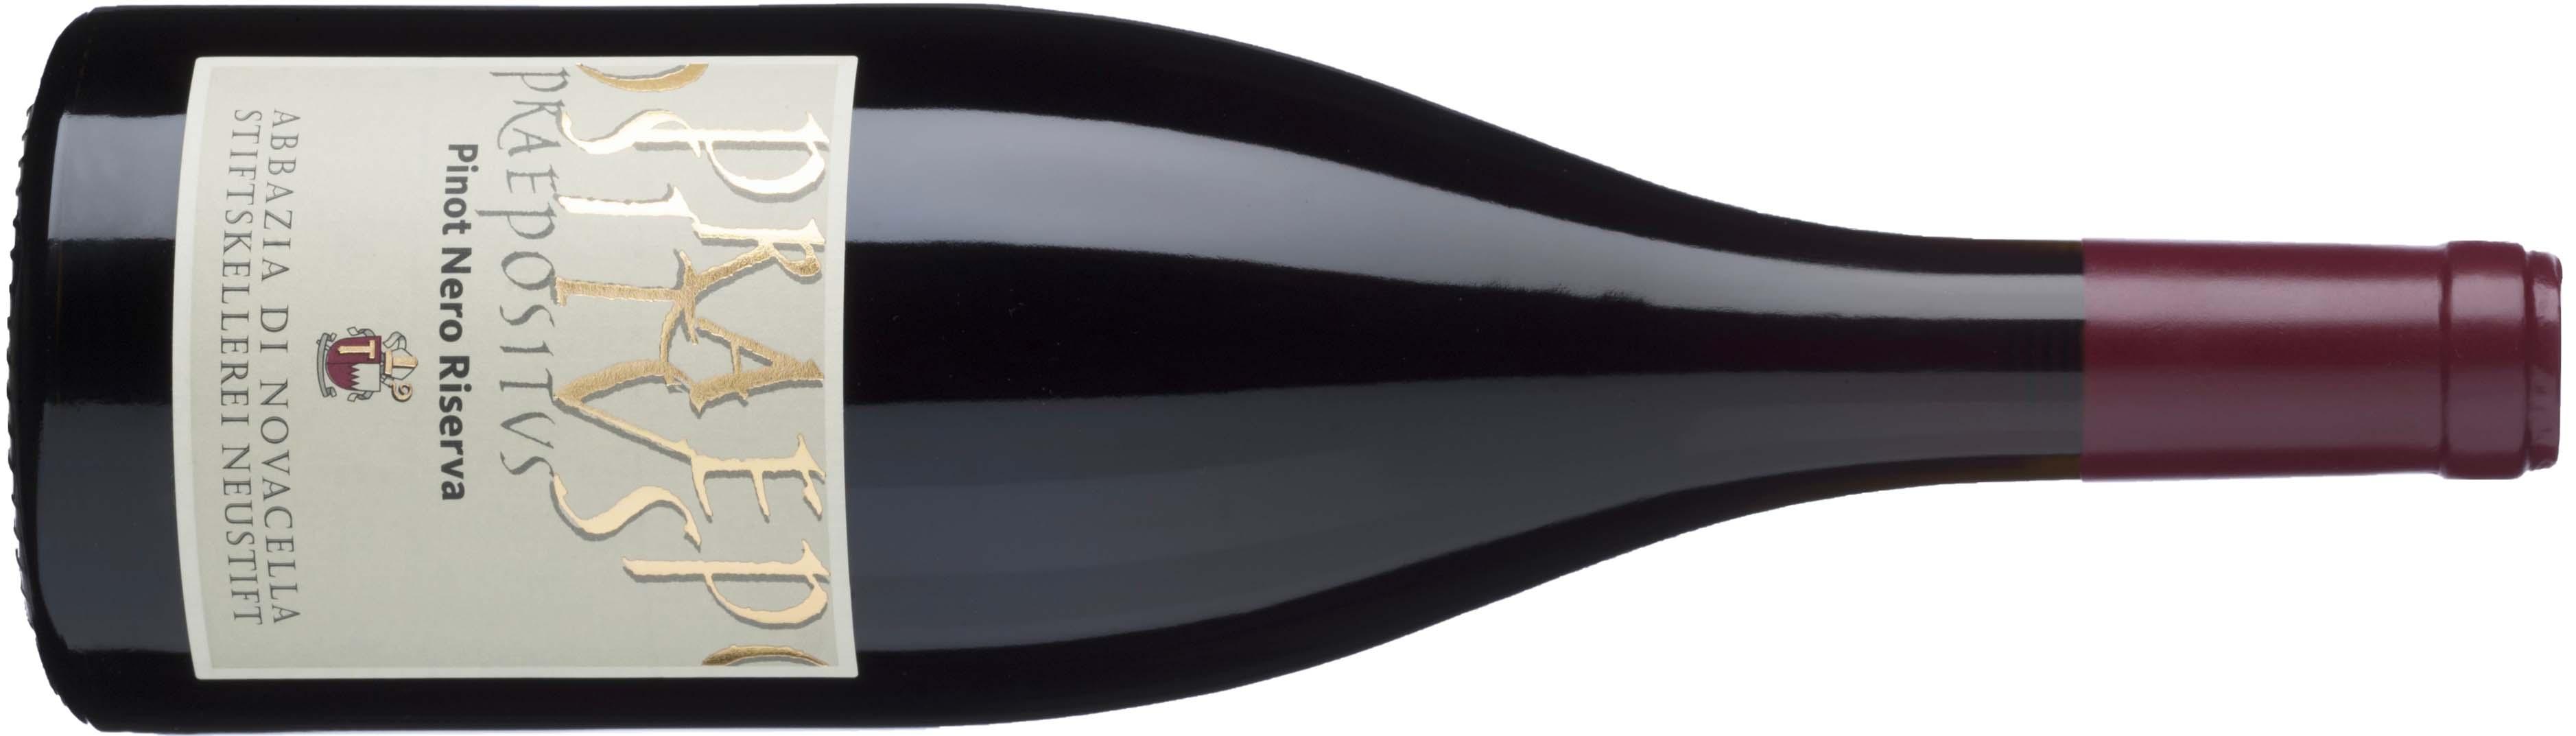 PRAEPOSITUS Pinot Nero Riserva